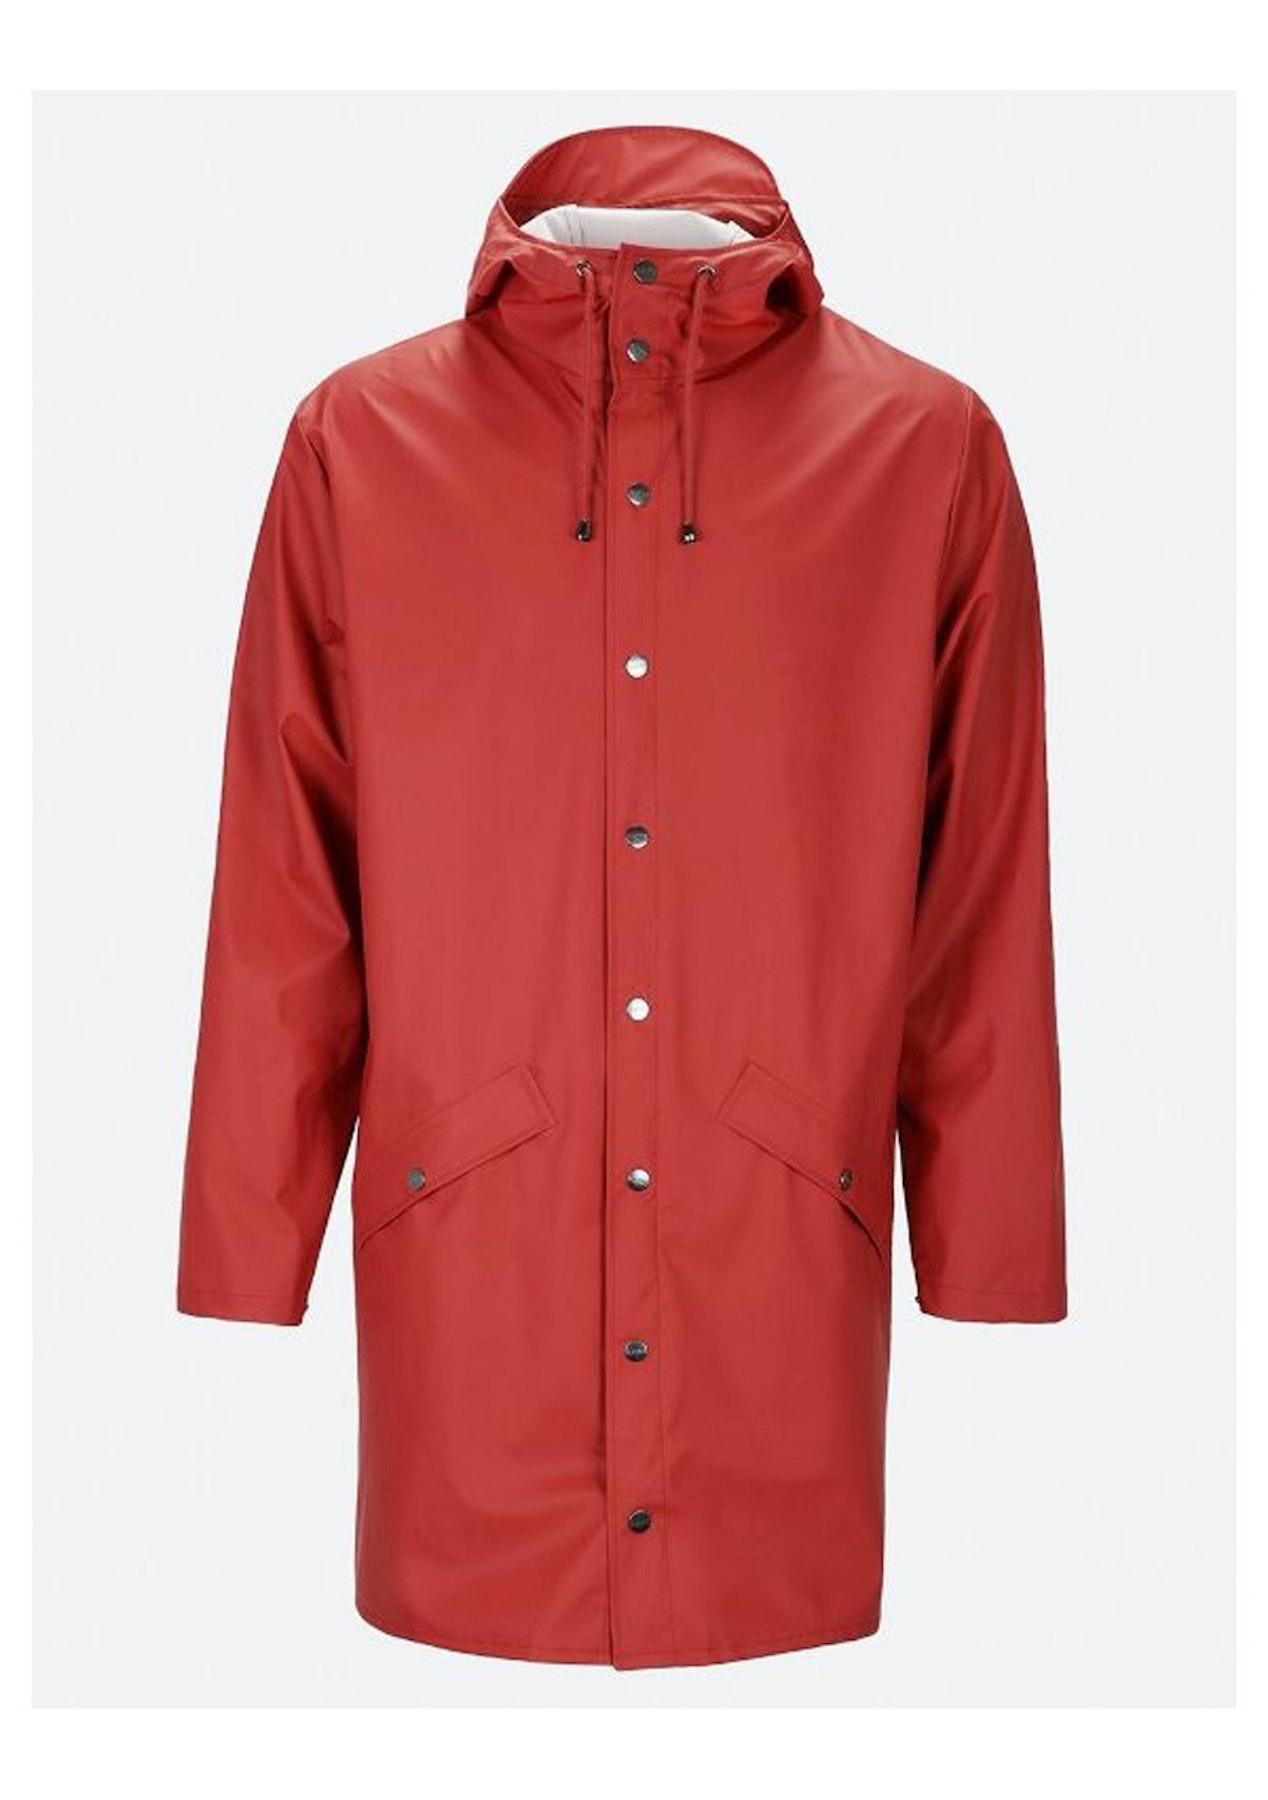 69971dc5c Rains - Long Jacket (unisex) - Carlet